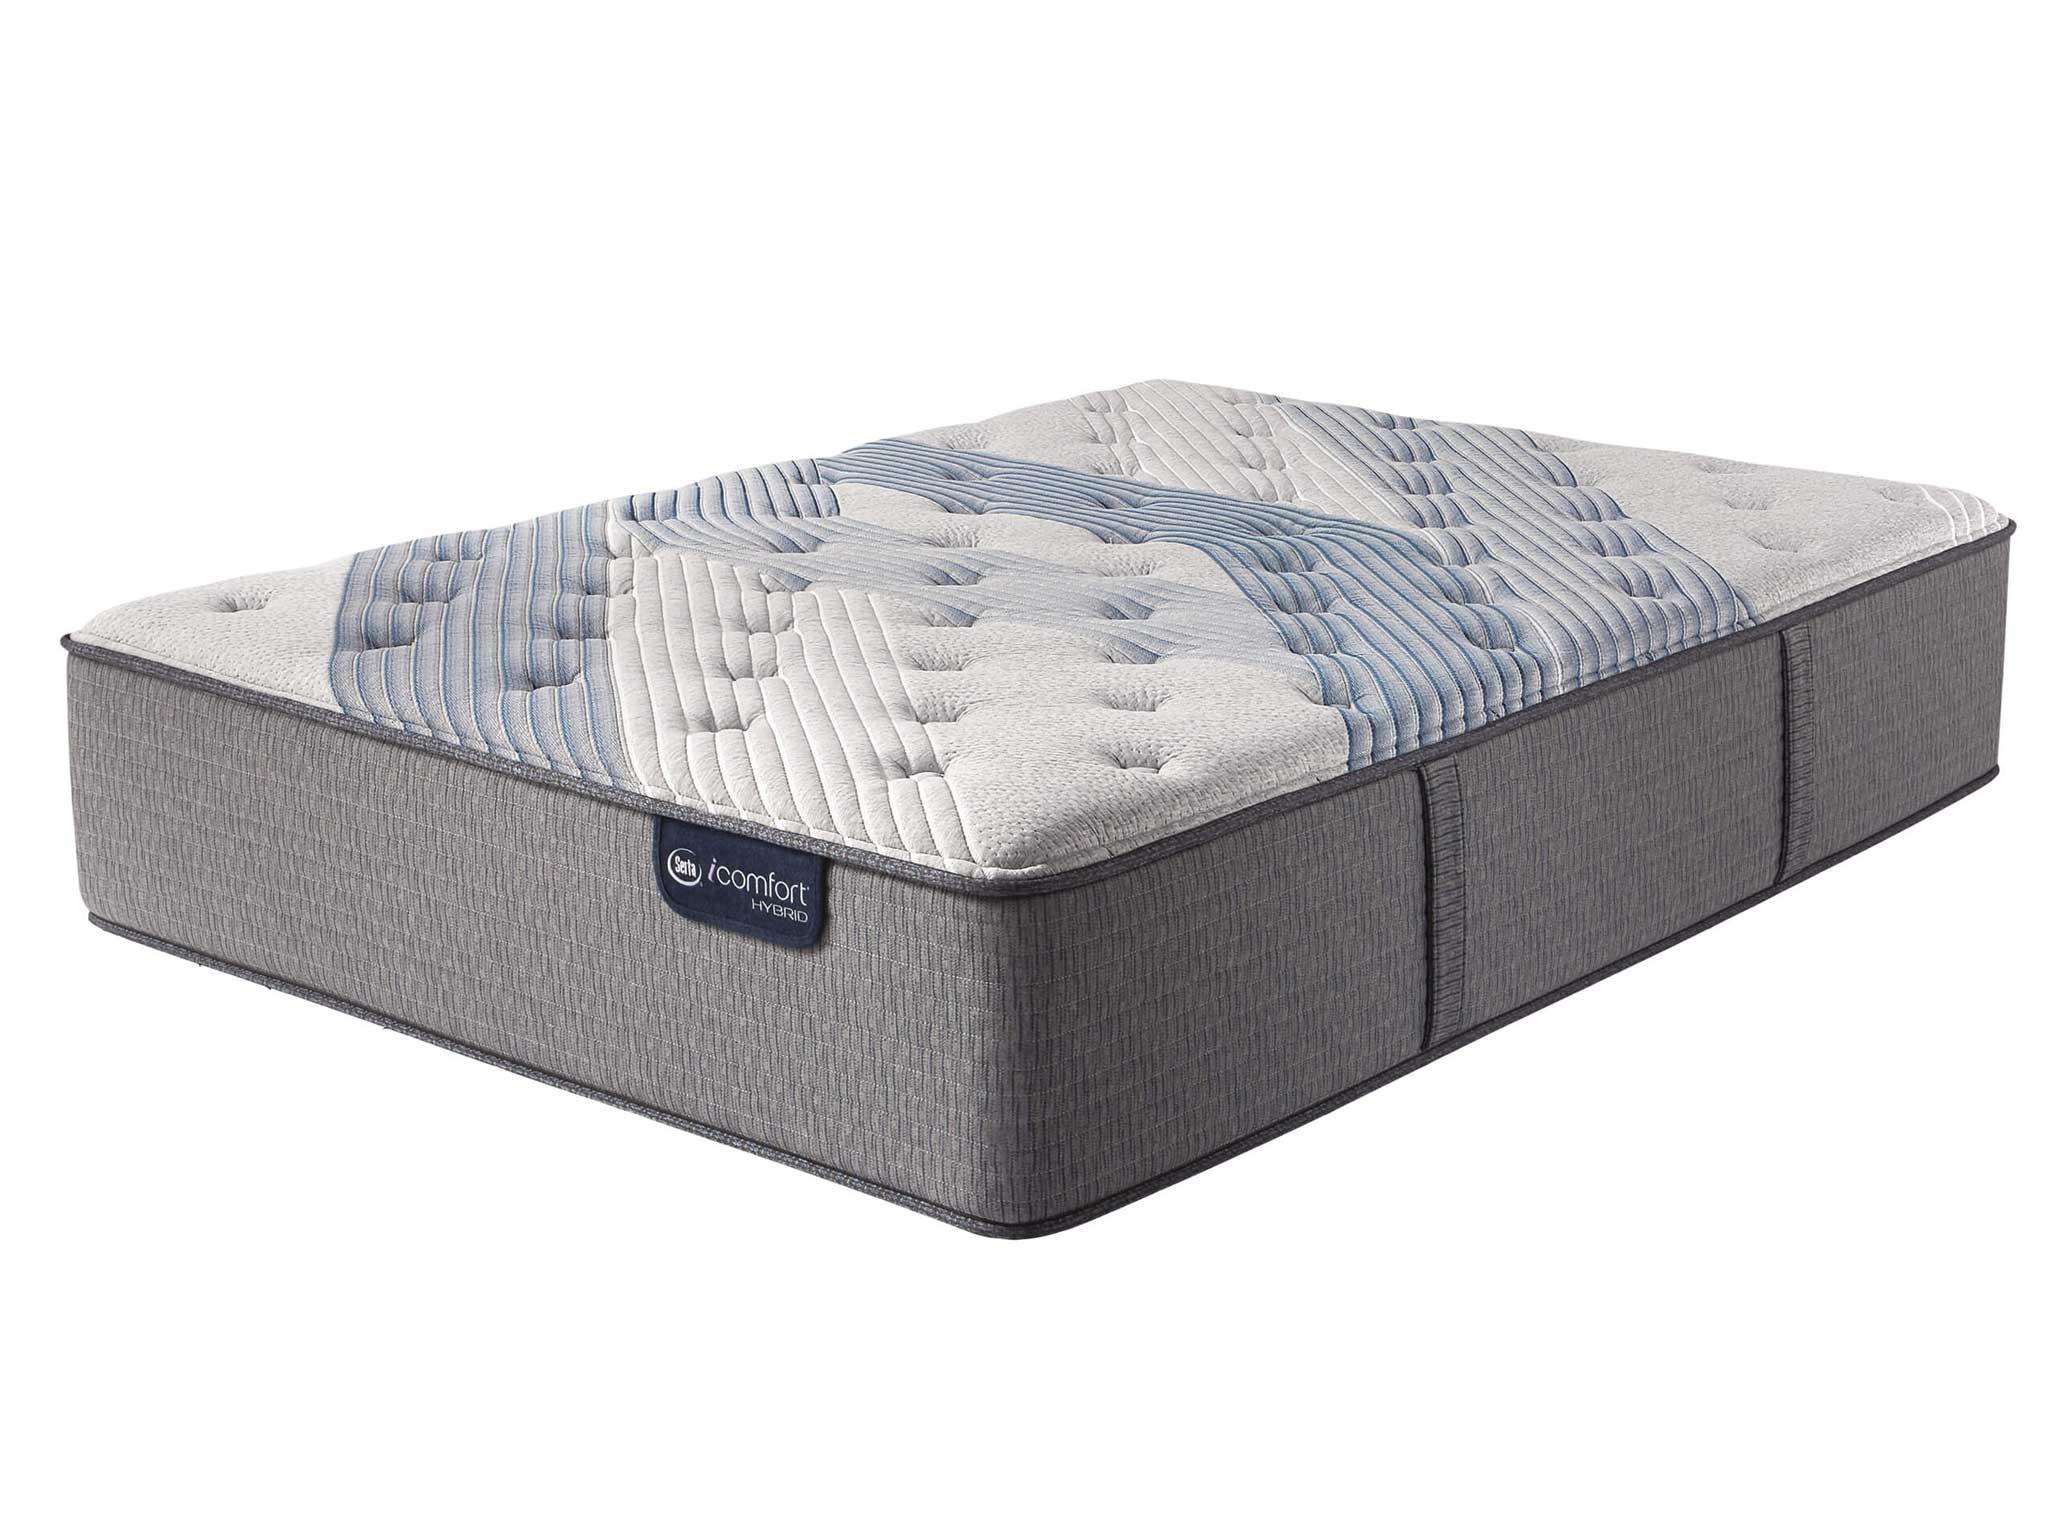 Icomfort Hybrid Blue Fusion 1000 Firm Best Mattress